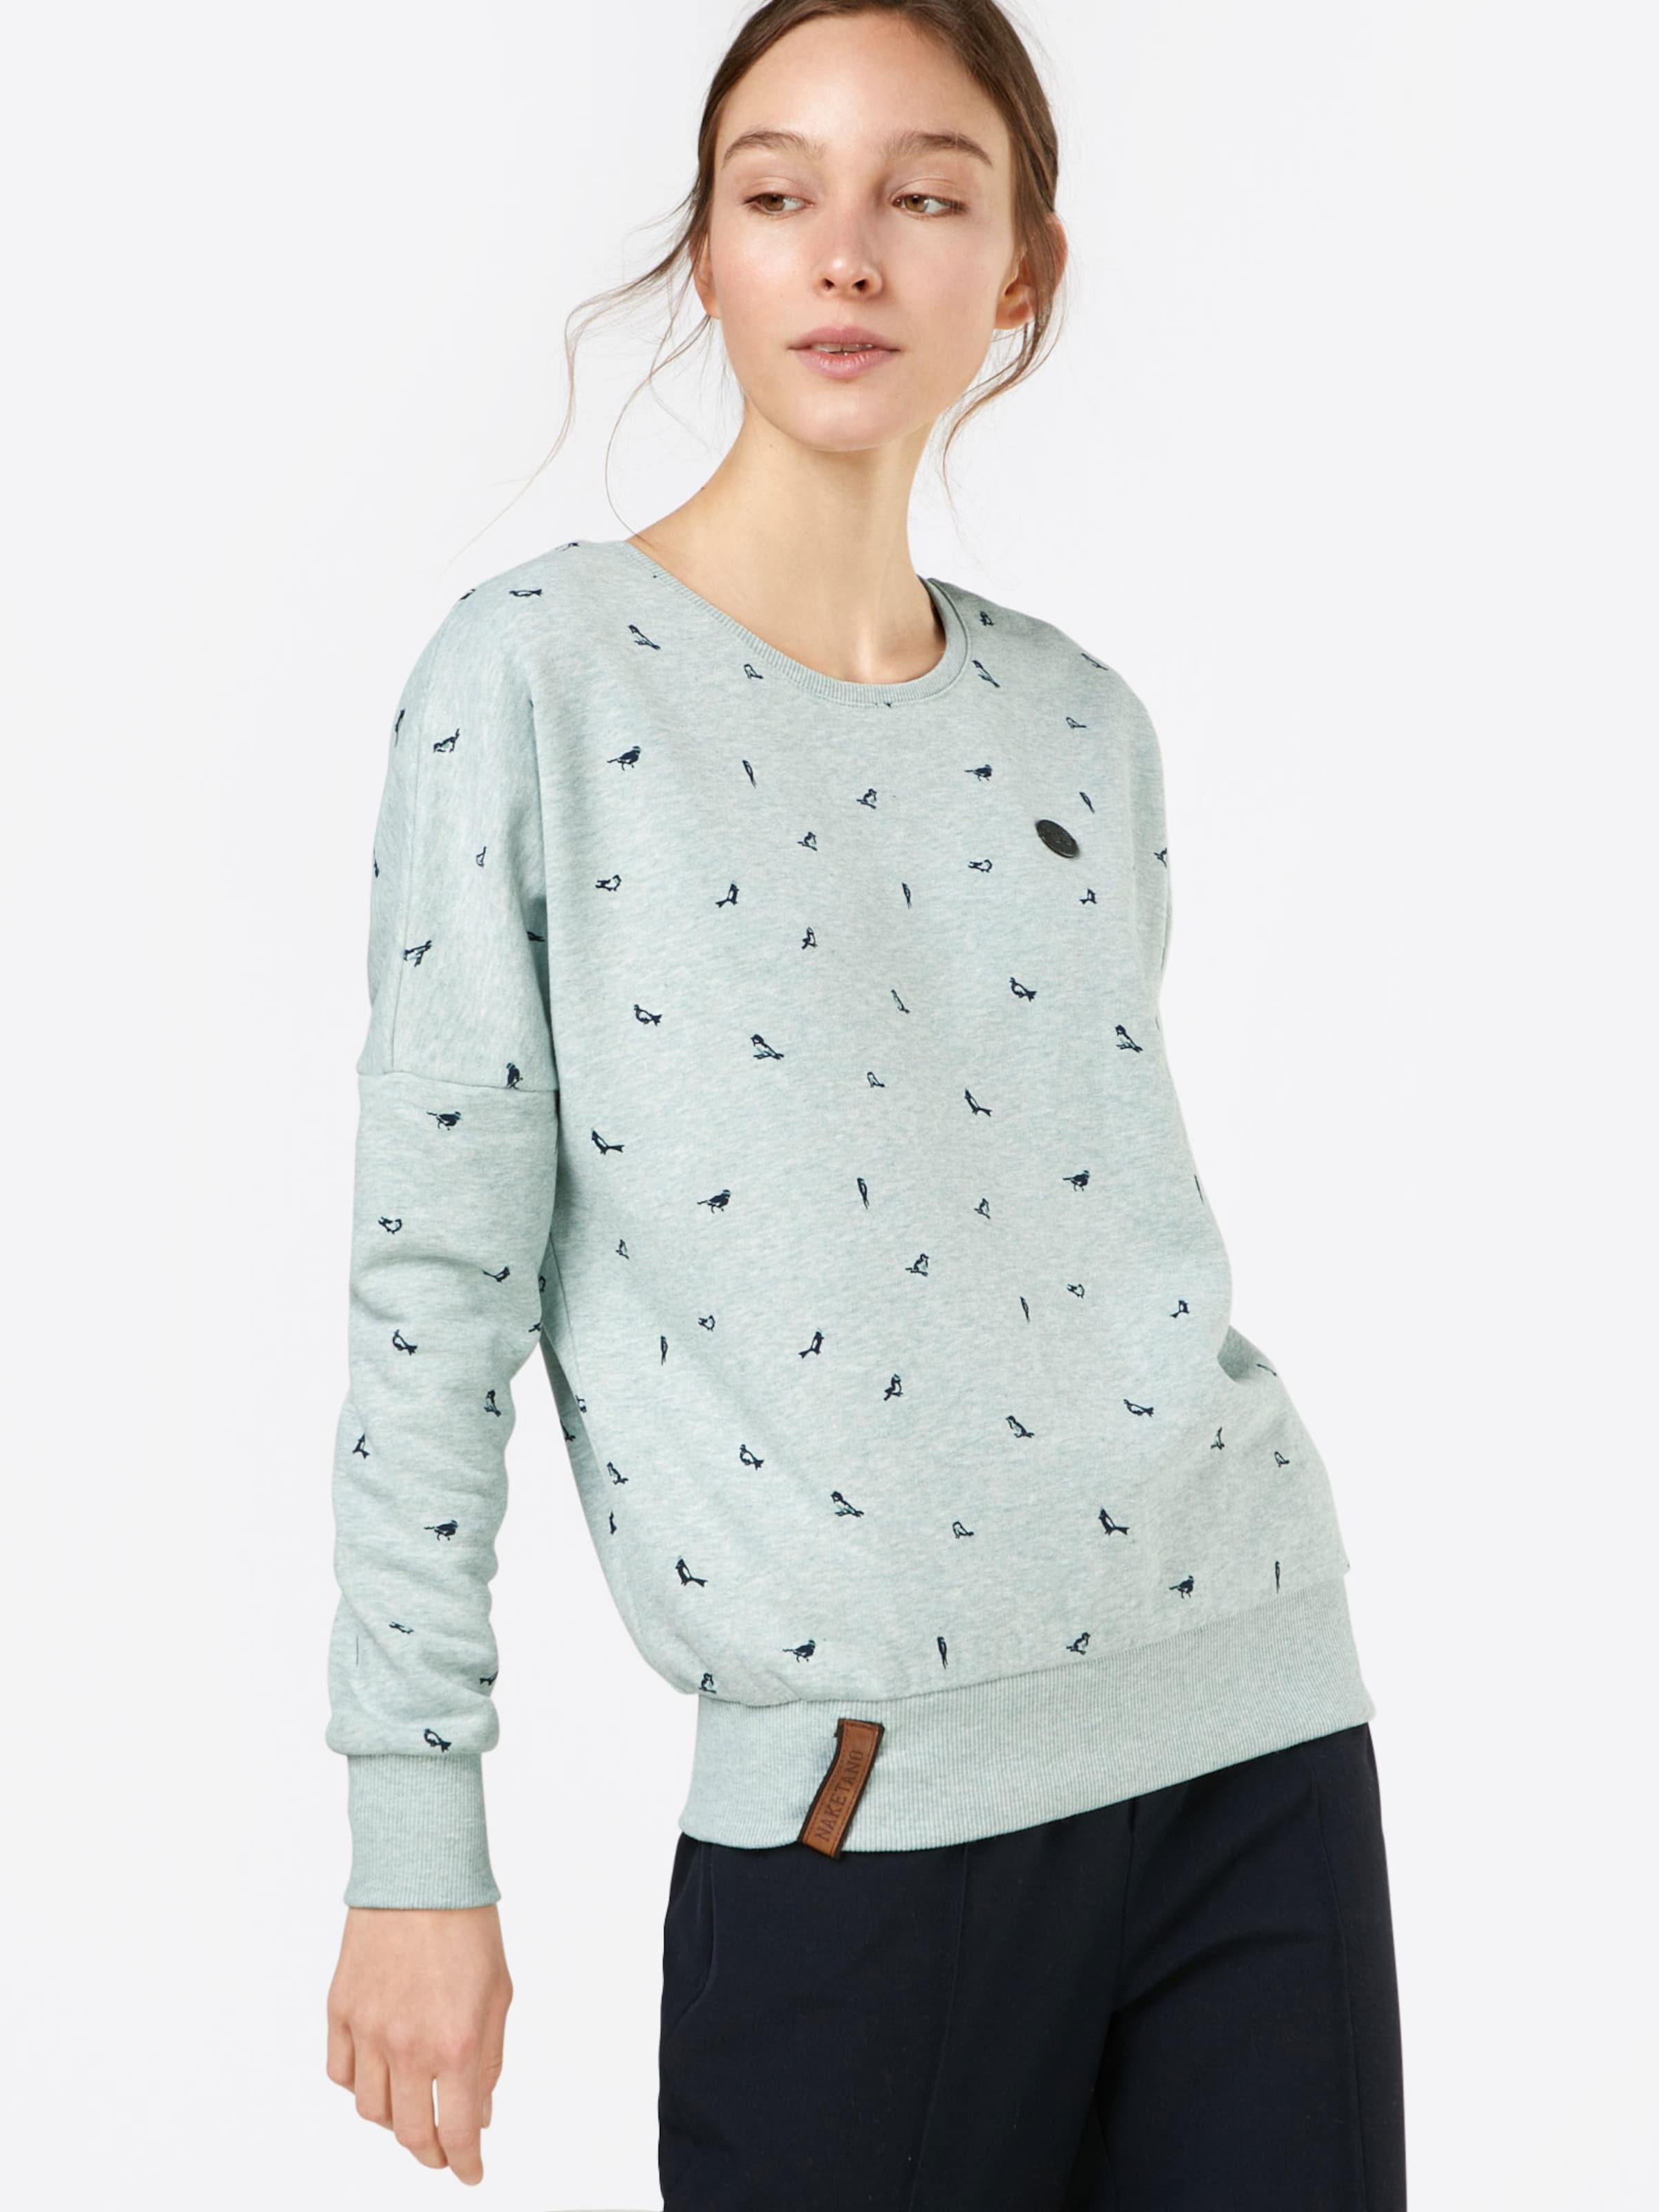 Naketano Sweater Sweater 'afterhour' Naketano In 'afterhour' Rauchblau 76ygbfIYv